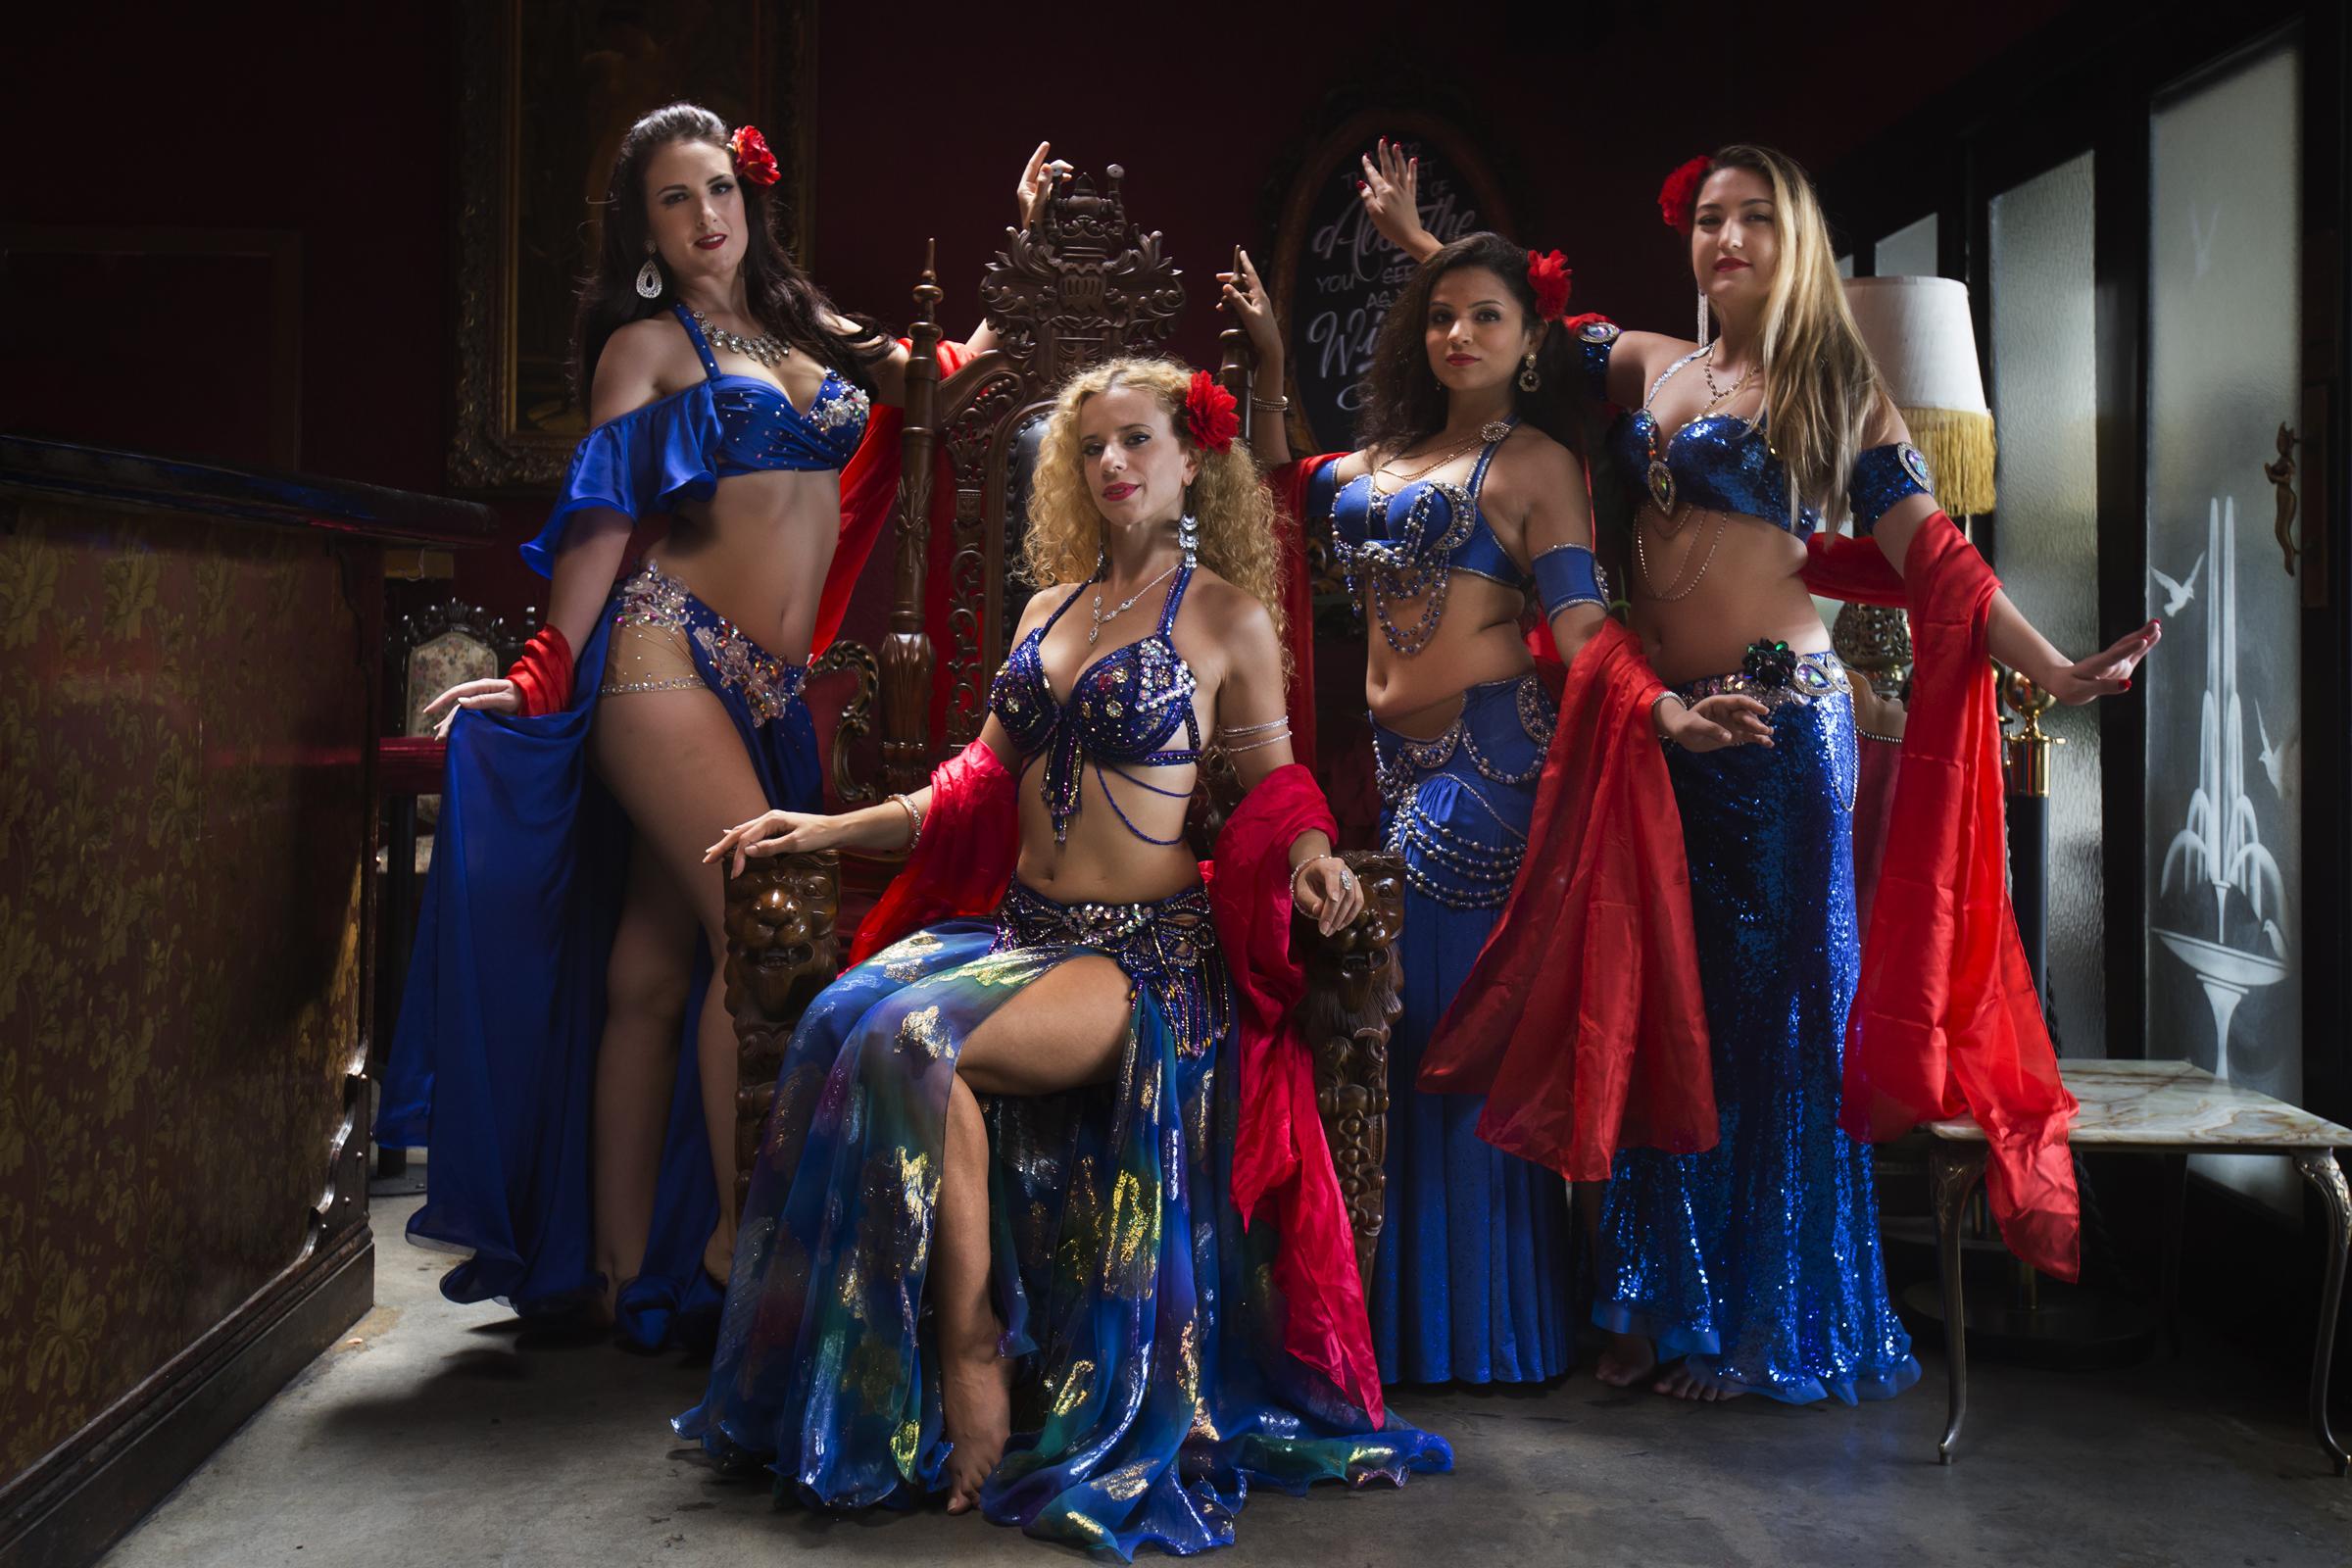 belly dancer Melbourne hire, belly dancers Melbourne, wedding entertainment Melbourne